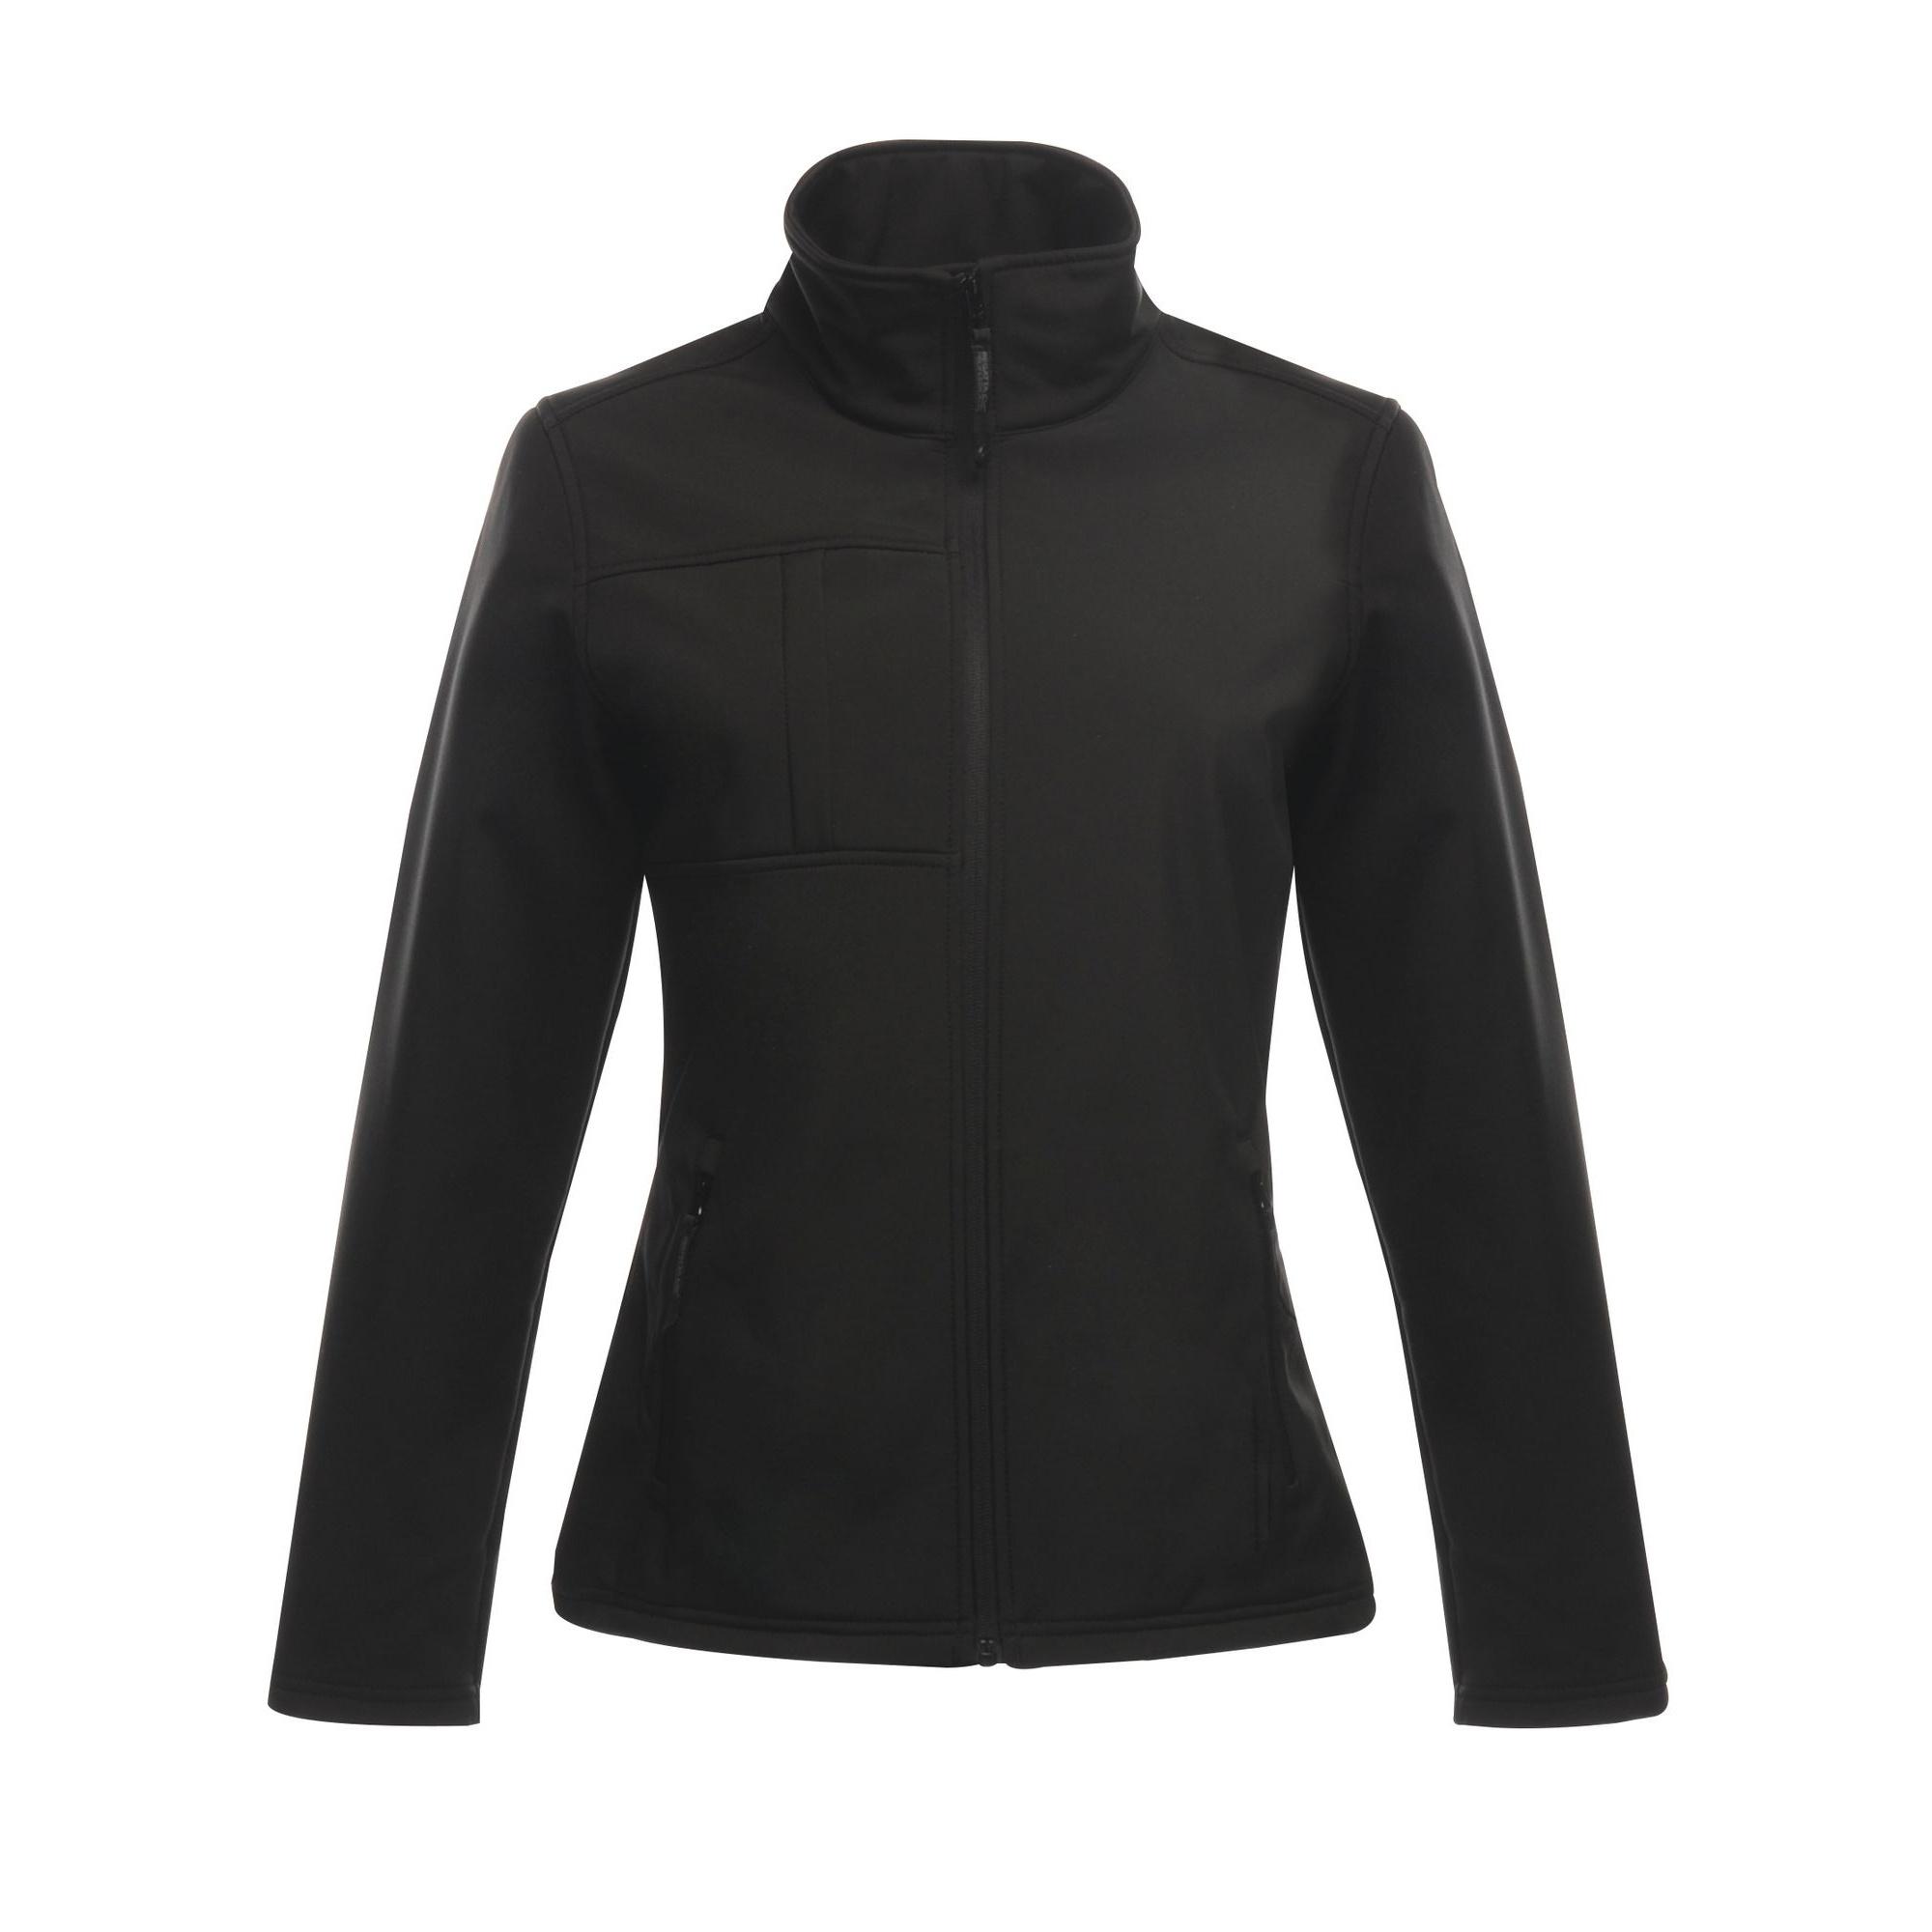 Regatta Professional Womens/Ladies Octagon II Waterproof Softshell Jacket (14) (Black/Black)